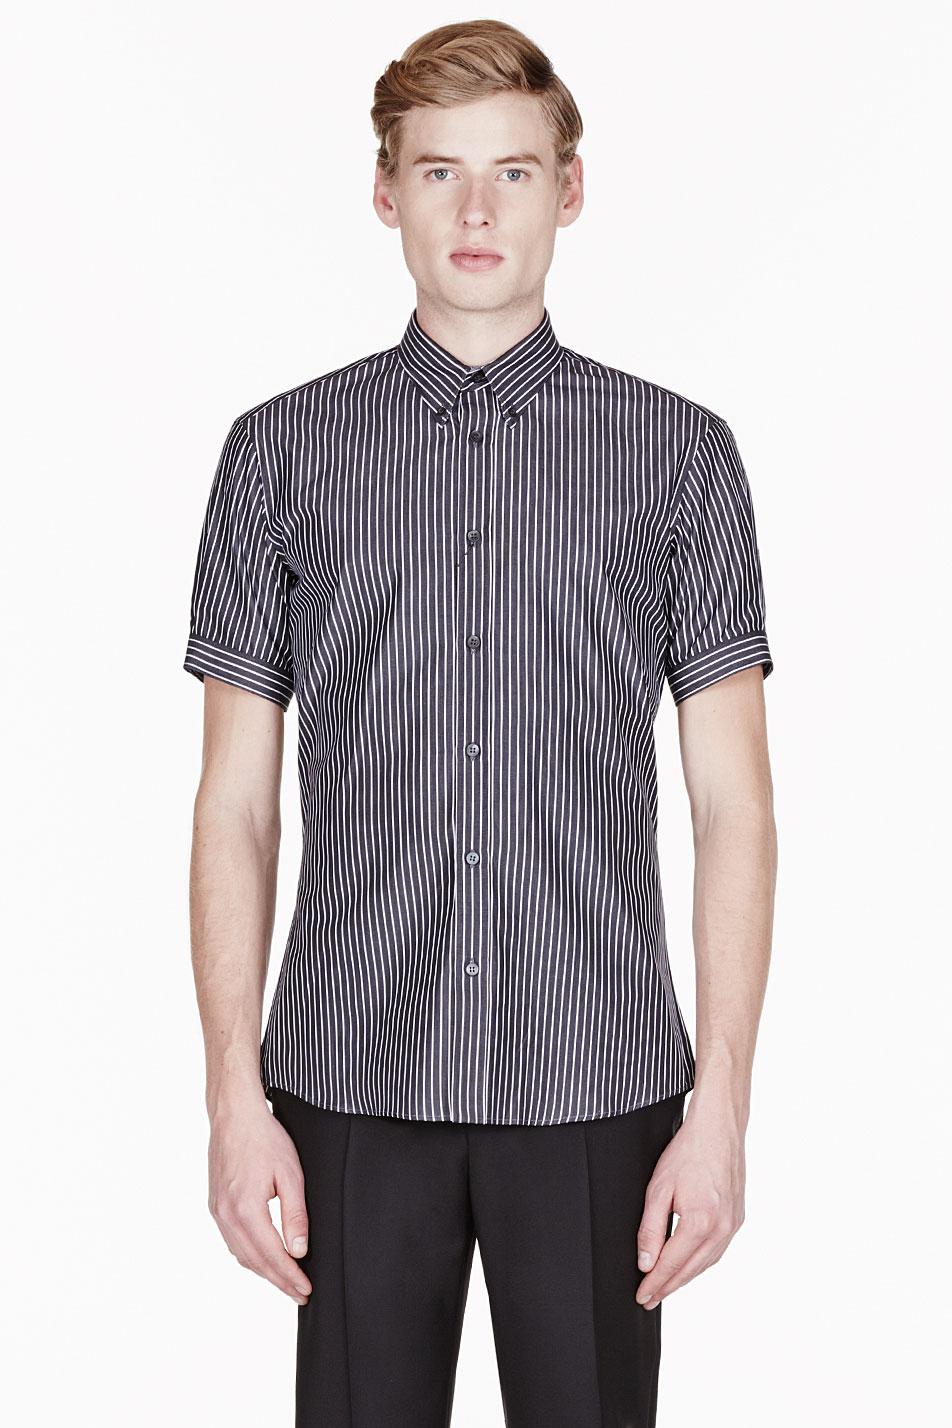 alexander mcqueen black and white pinstripe button down shirt